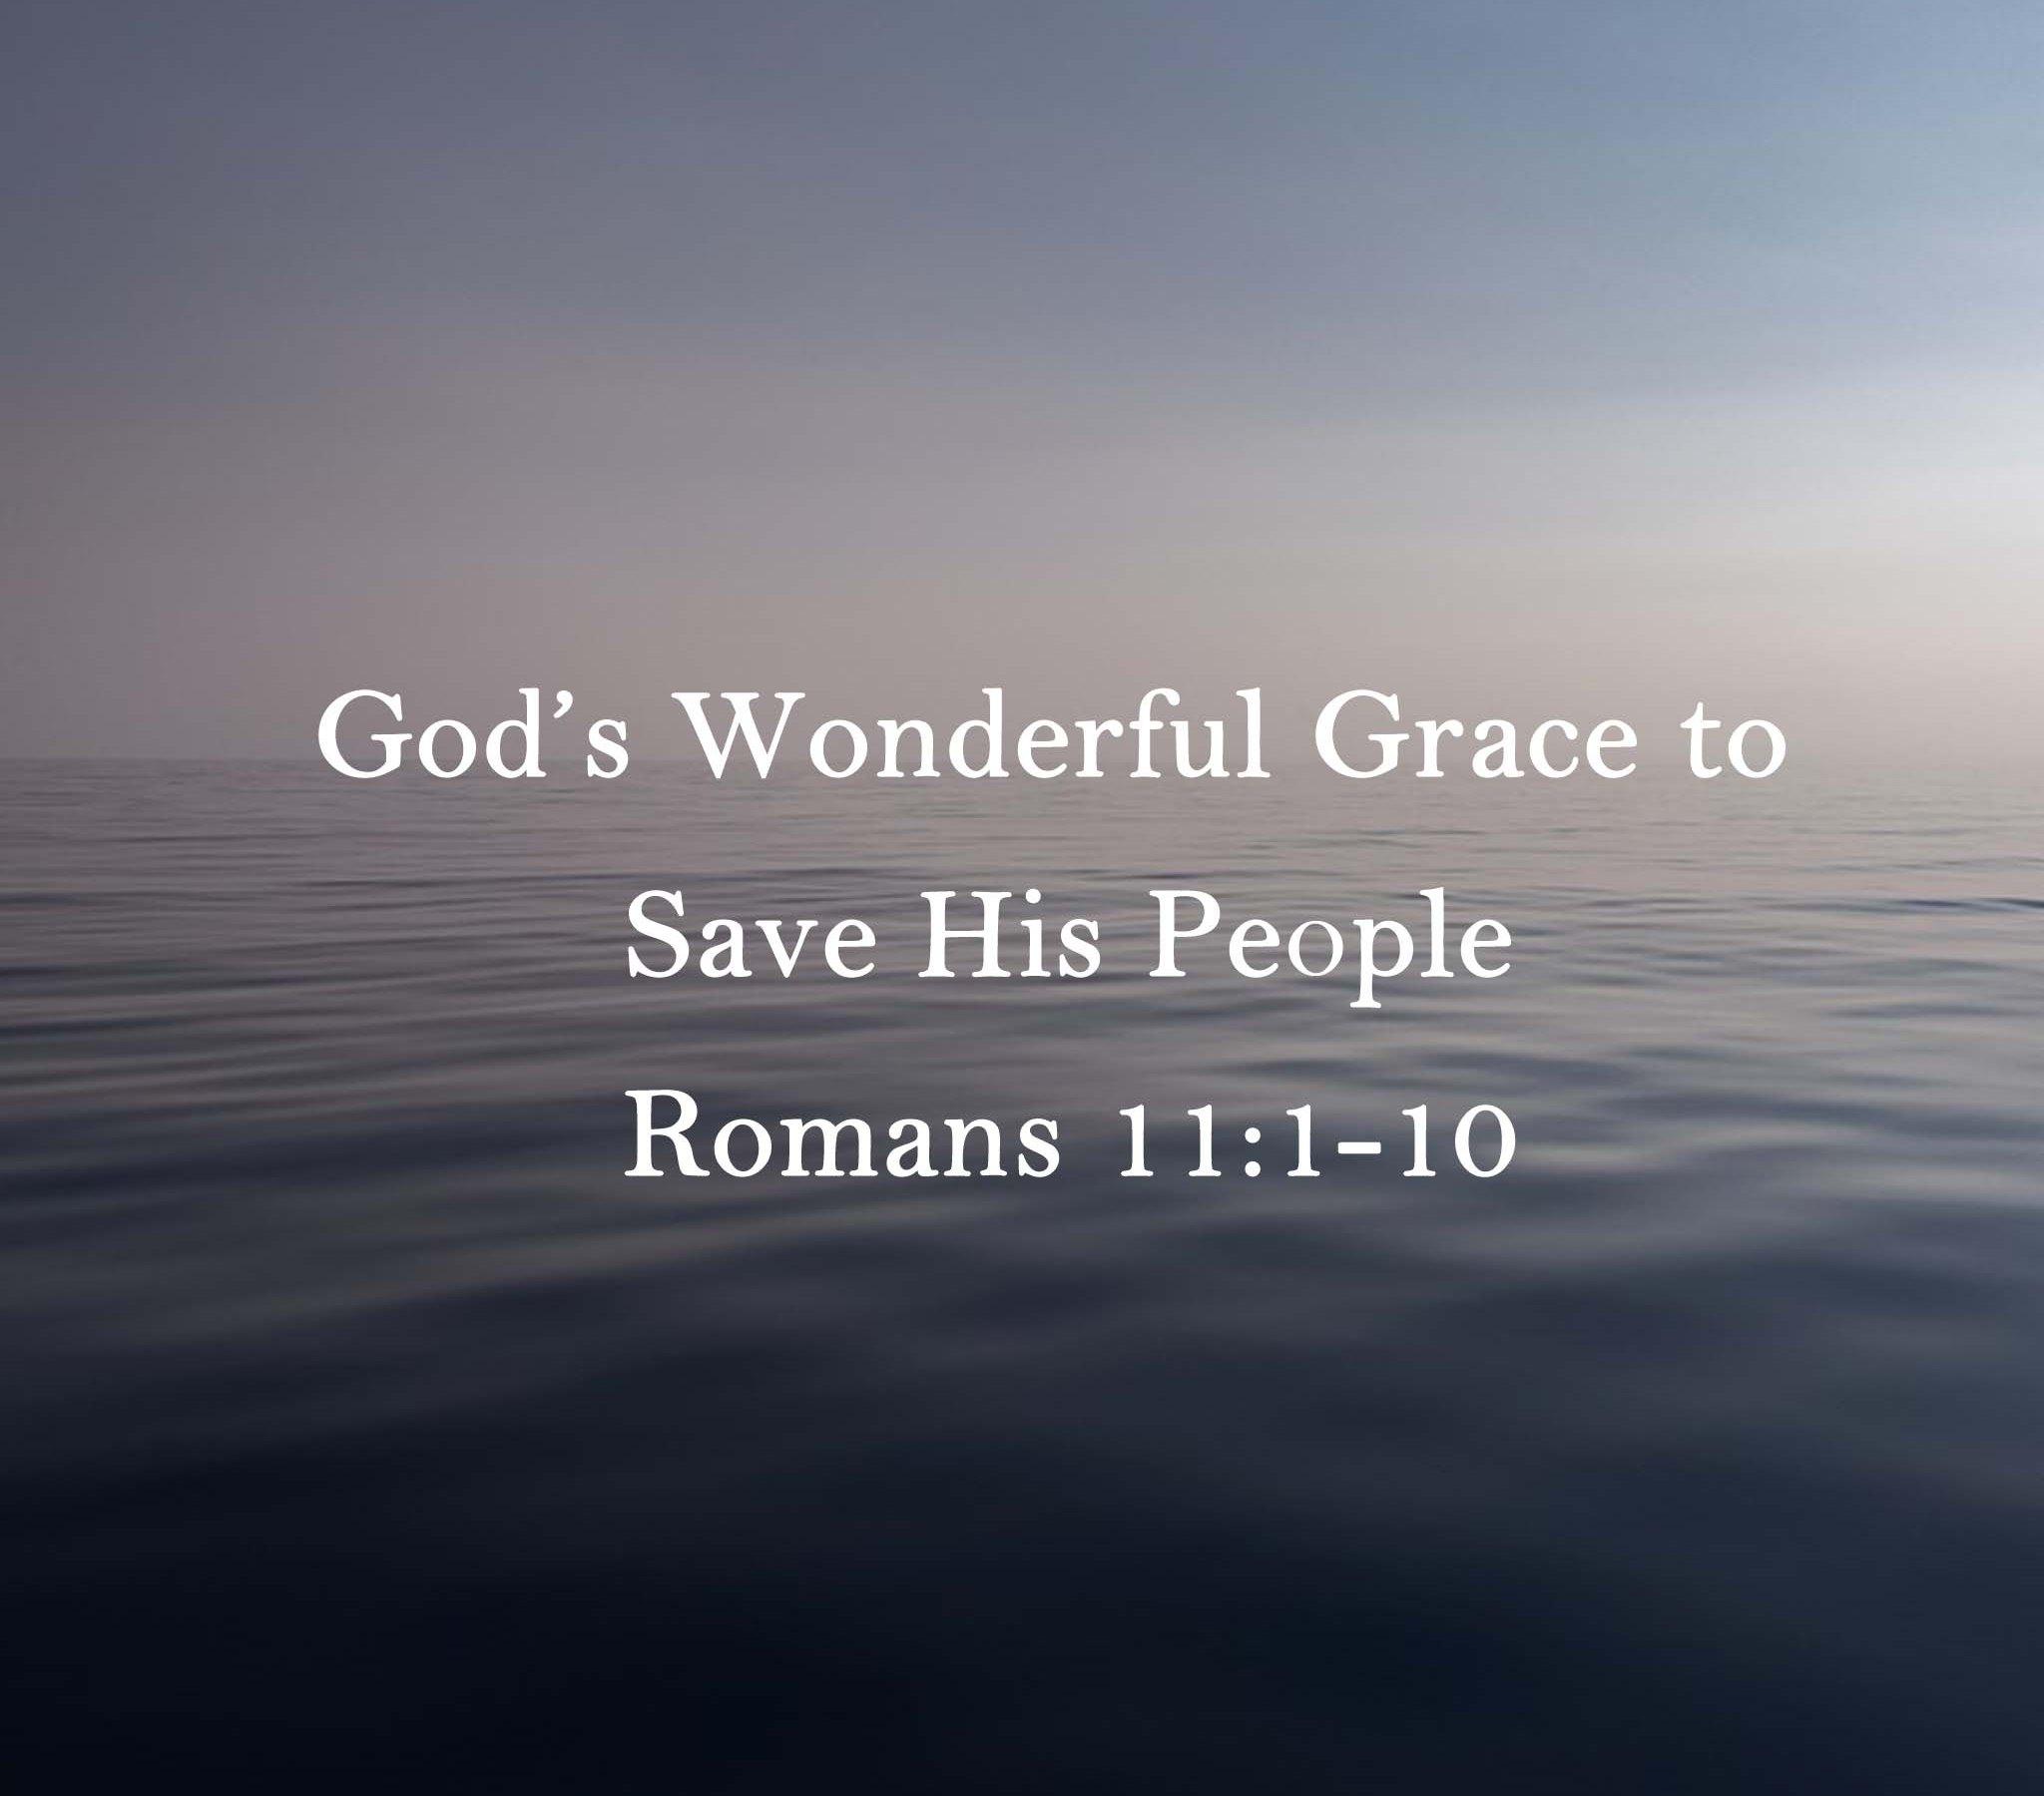 Sermon: God's Wonderful Grace to Save His People Romans 11:1-10